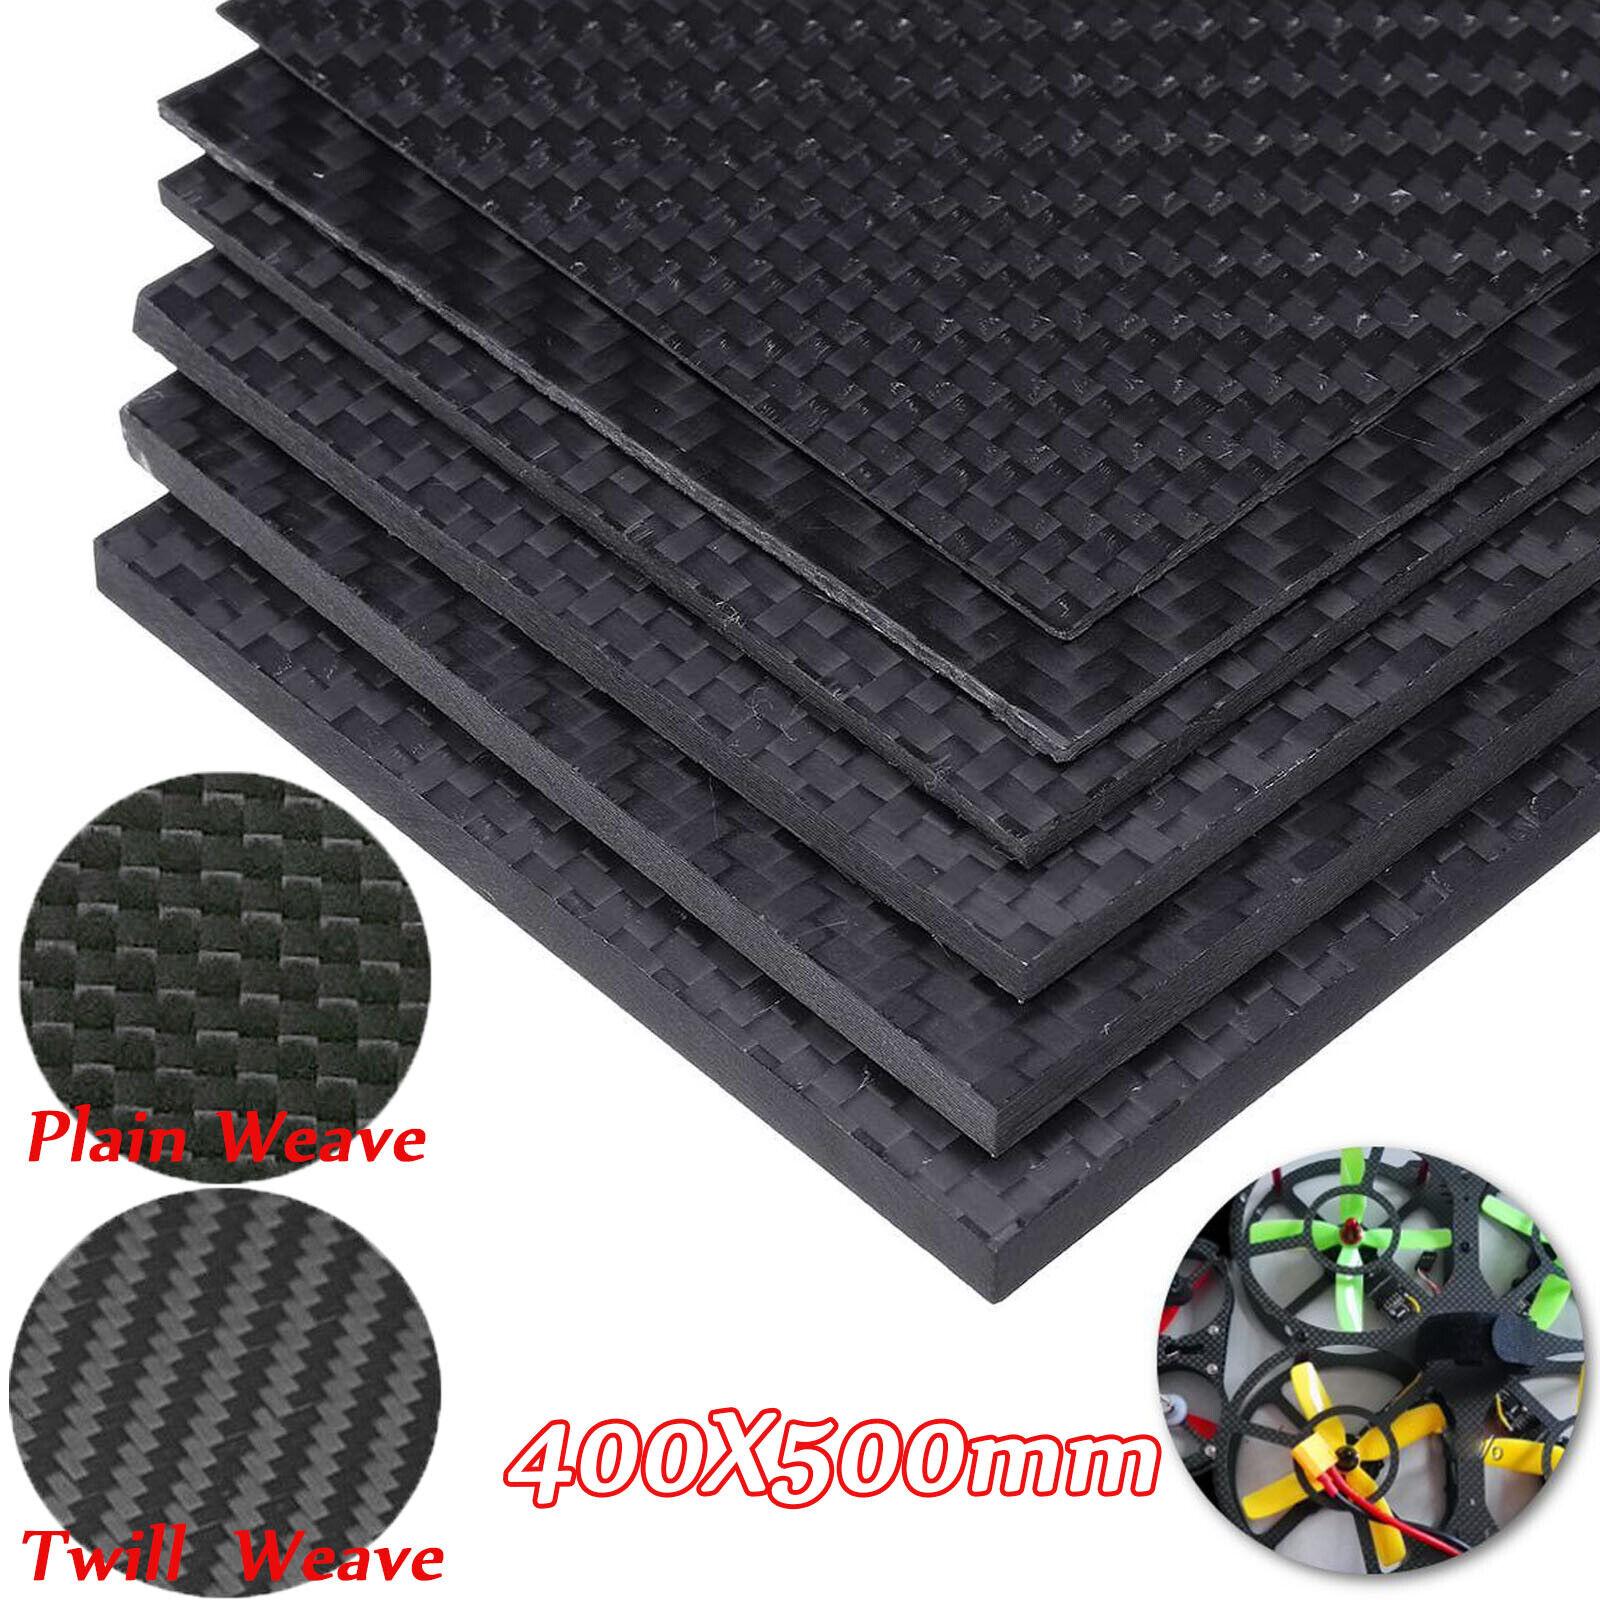 NEW 125×75×5mm Twill Weave Carbon Fiber Plate Panel Sheet